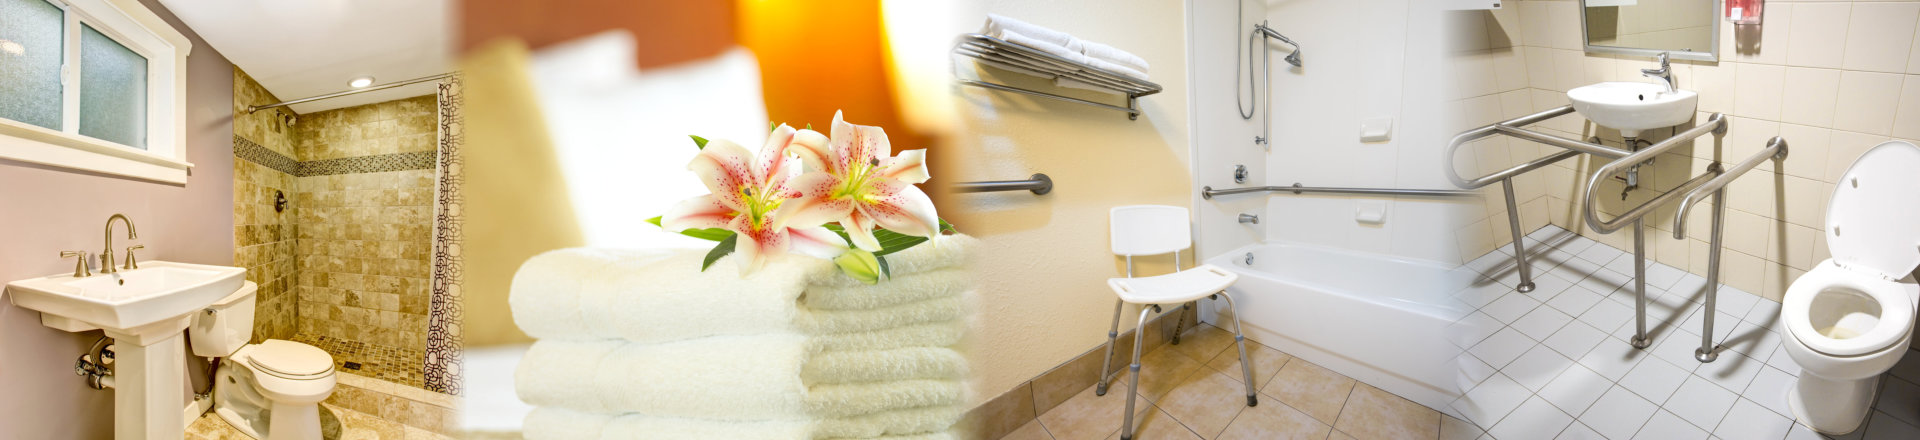 Bathcare